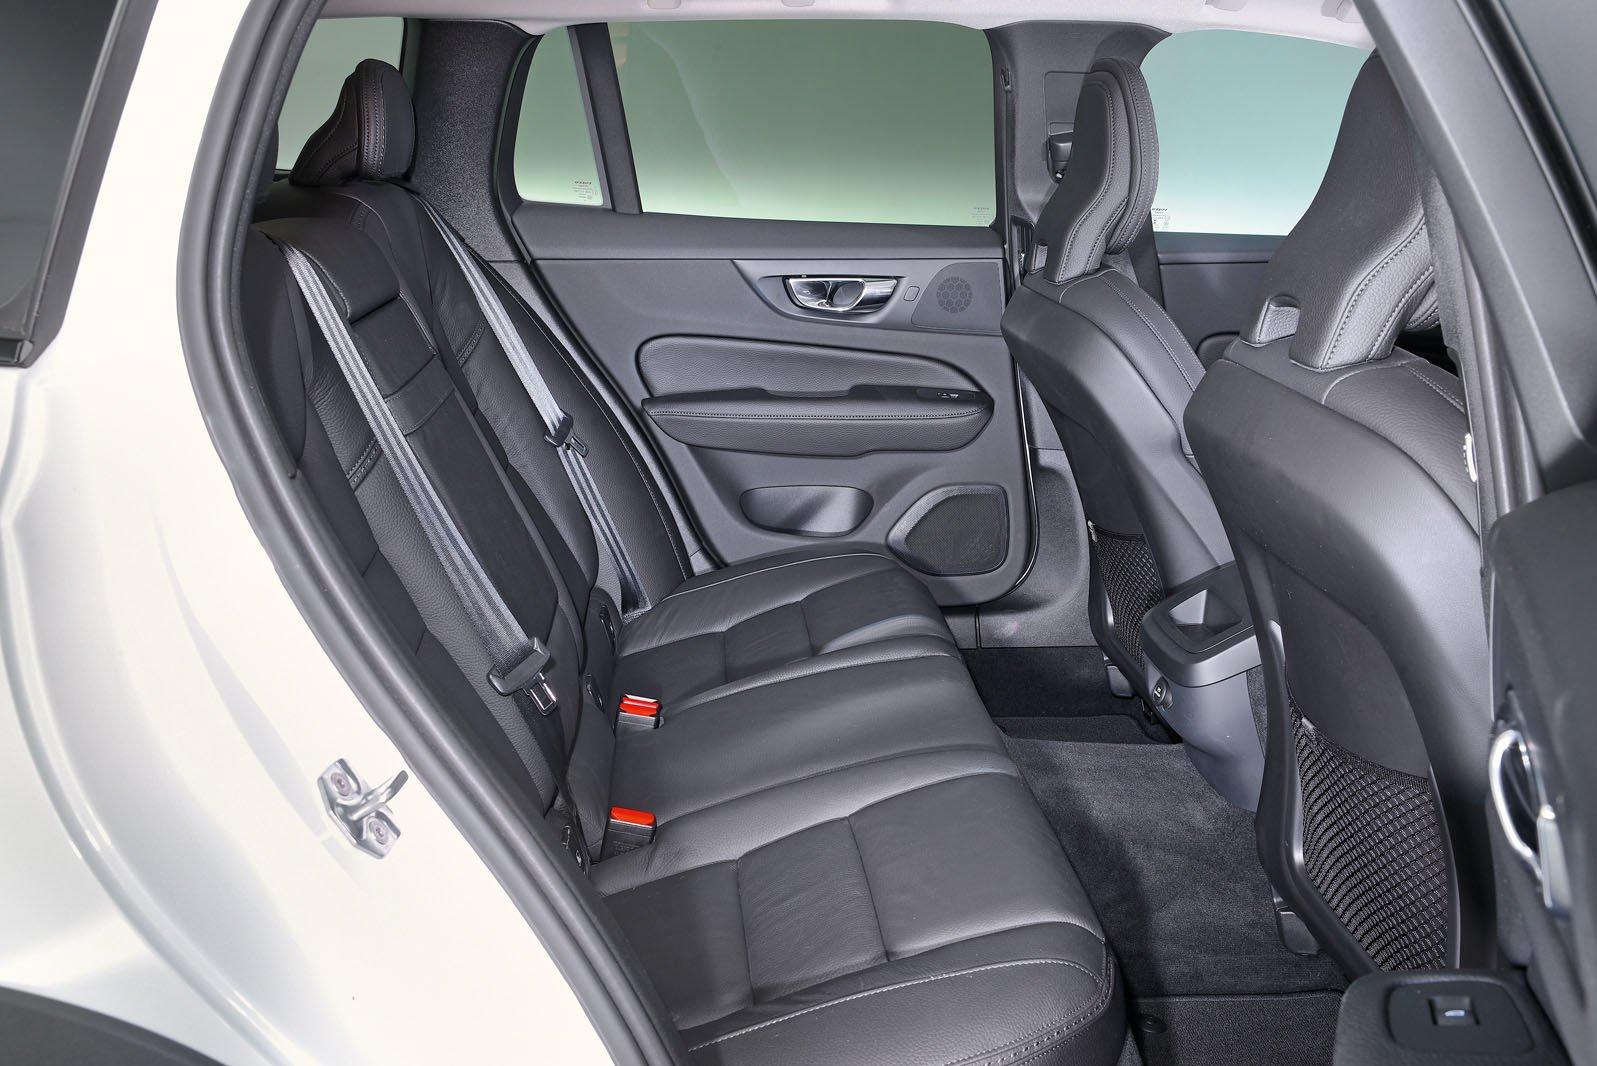 Volvo V60 rear seats